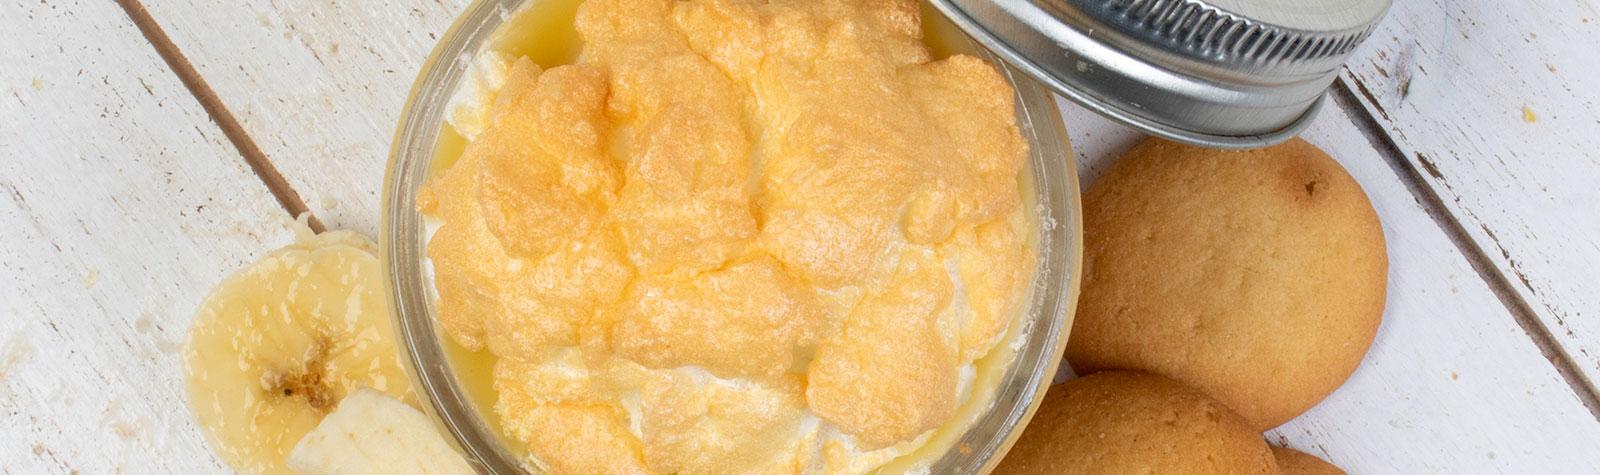 Southern Style Baked Banana Pudding